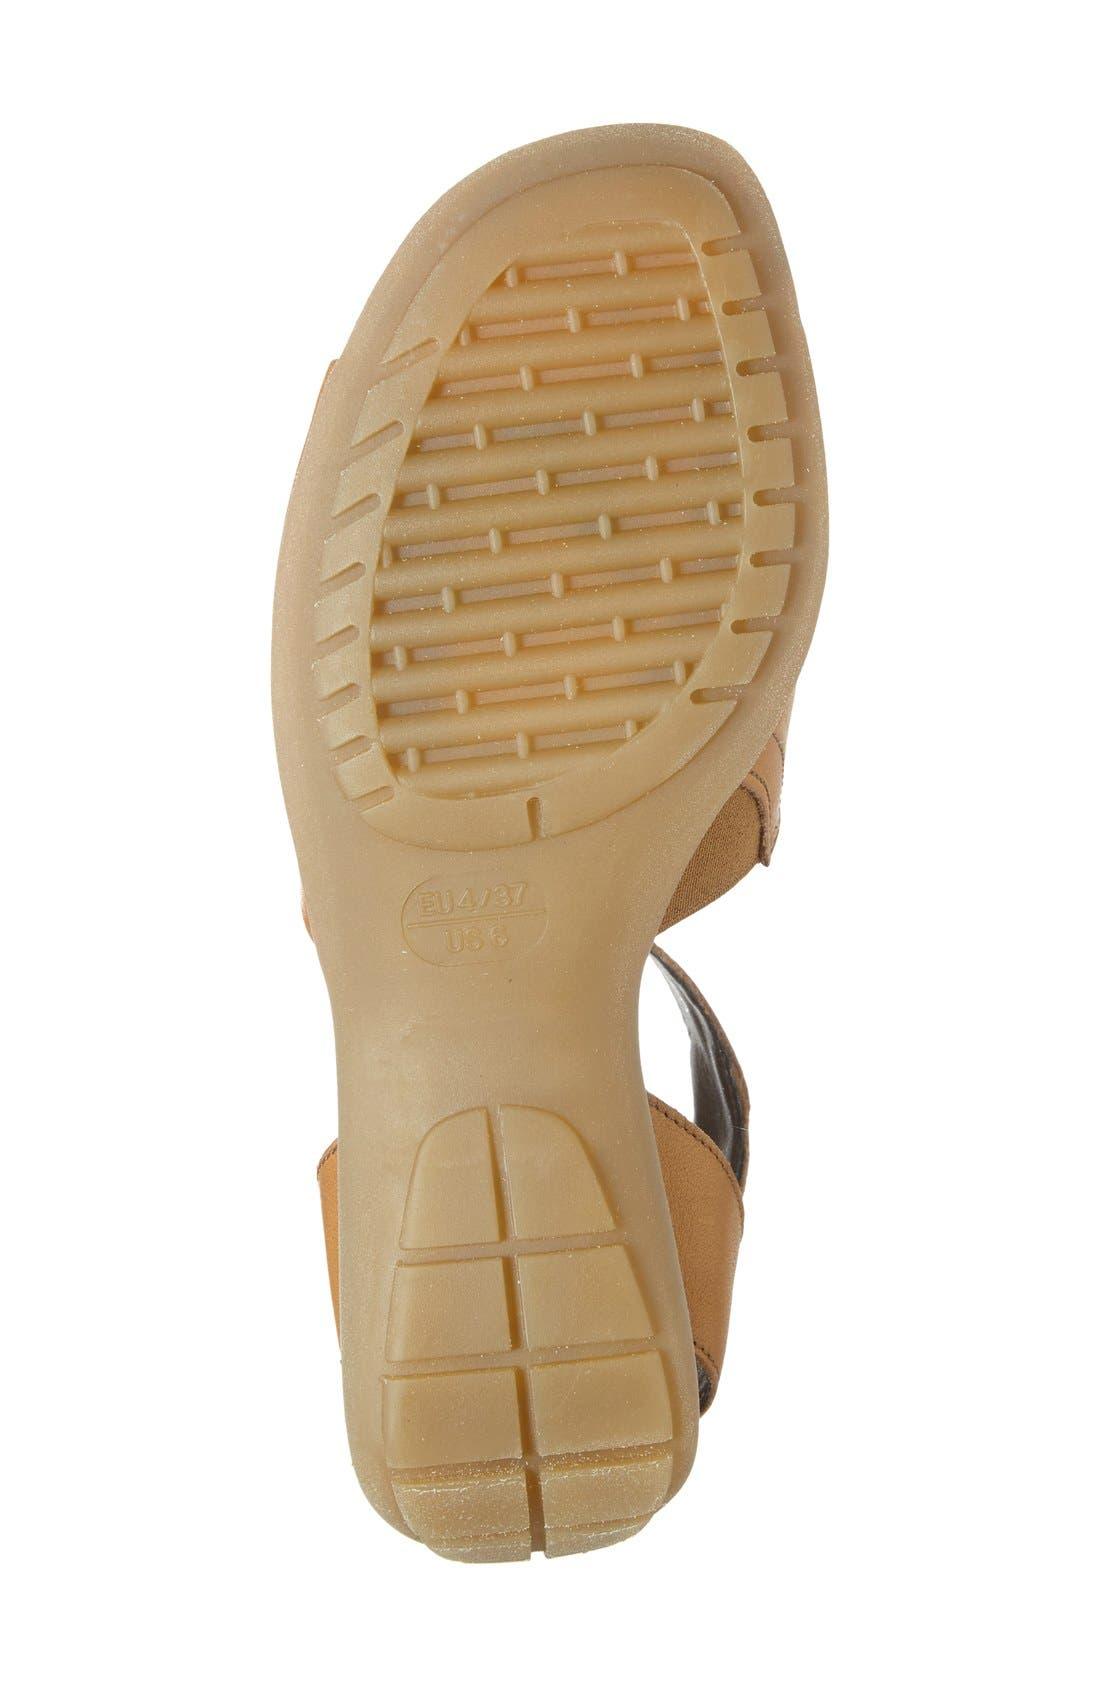 'Beglad' Leather Ankle Strap Sandal,                             Alternate thumbnail 7, color,                             Virginia Brown Leather